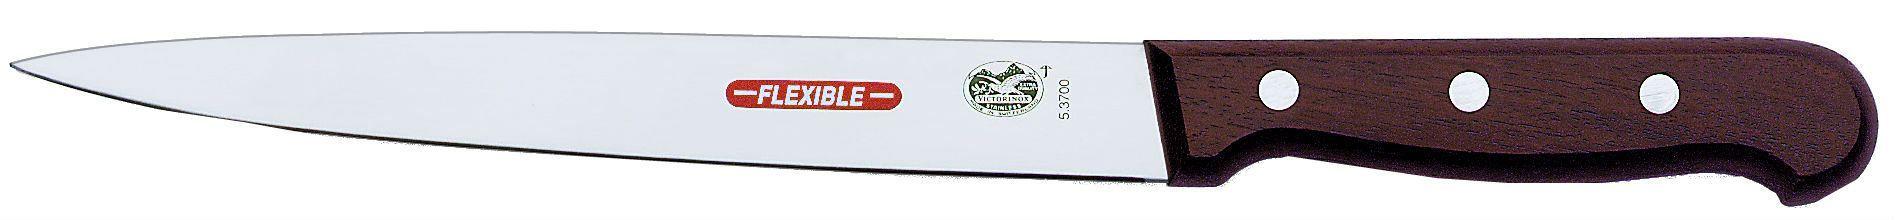 Victorinox 7.7163.18 - нож филейный, лезвие 18 см (Black)